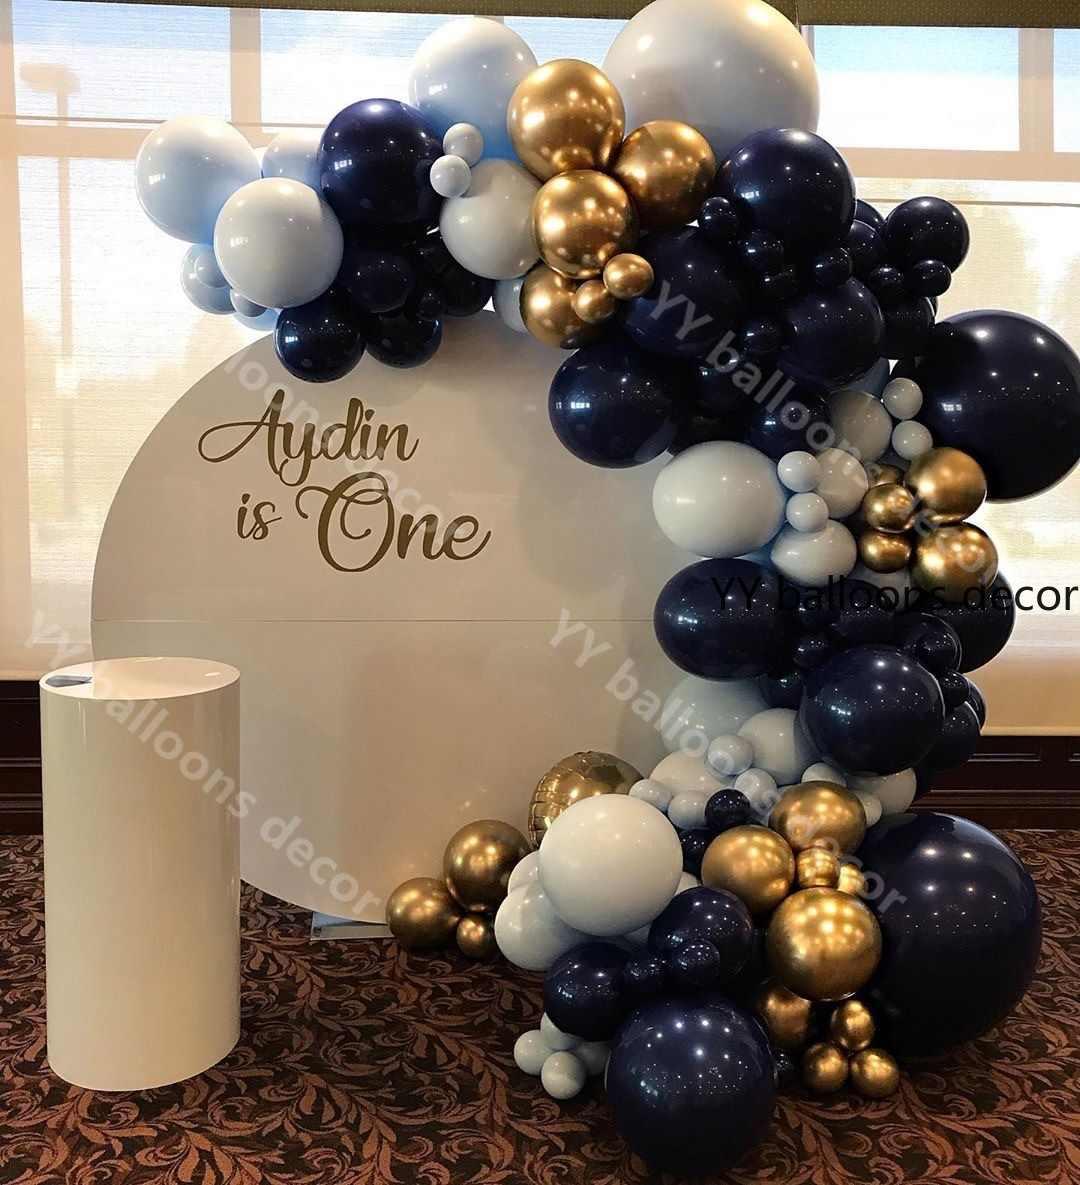 125pcs ร้อน Maca Navy Blue GOLD Pastel Global ลูกโป่ง Garland Arch ชุดวันเกิดงานแต่งงาน Baby Shower ครบรอบ PARTY ตกแต่ง